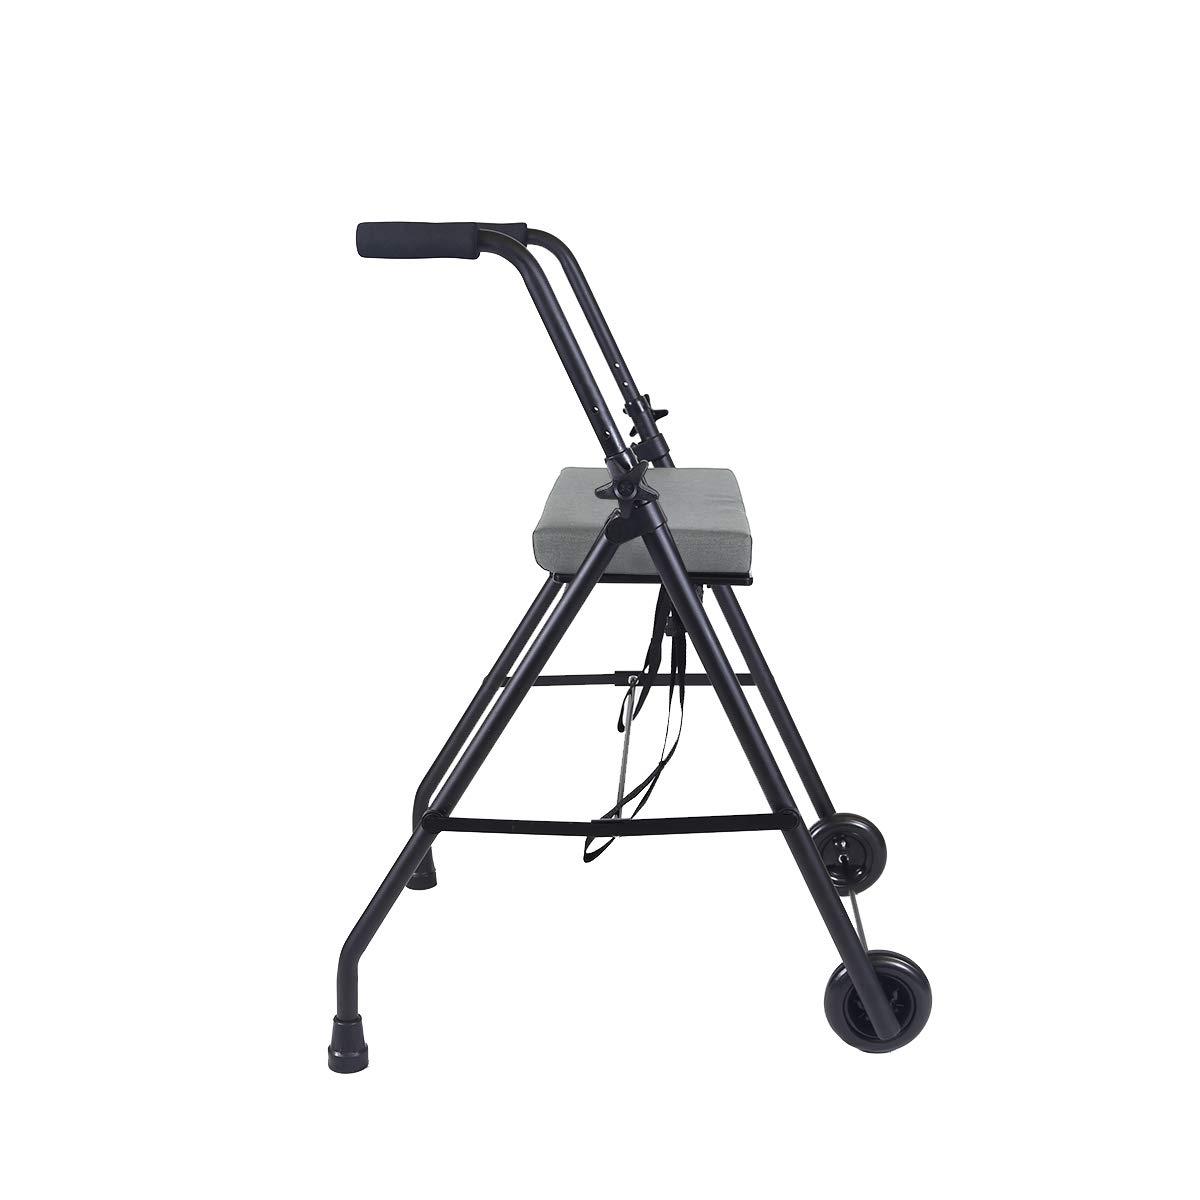 KMINA - Andadores ancianos plegable, Andadores adultos con asiento, Andadores ancianos 2 ruedas, COMFORT 2 Ruedas Negro